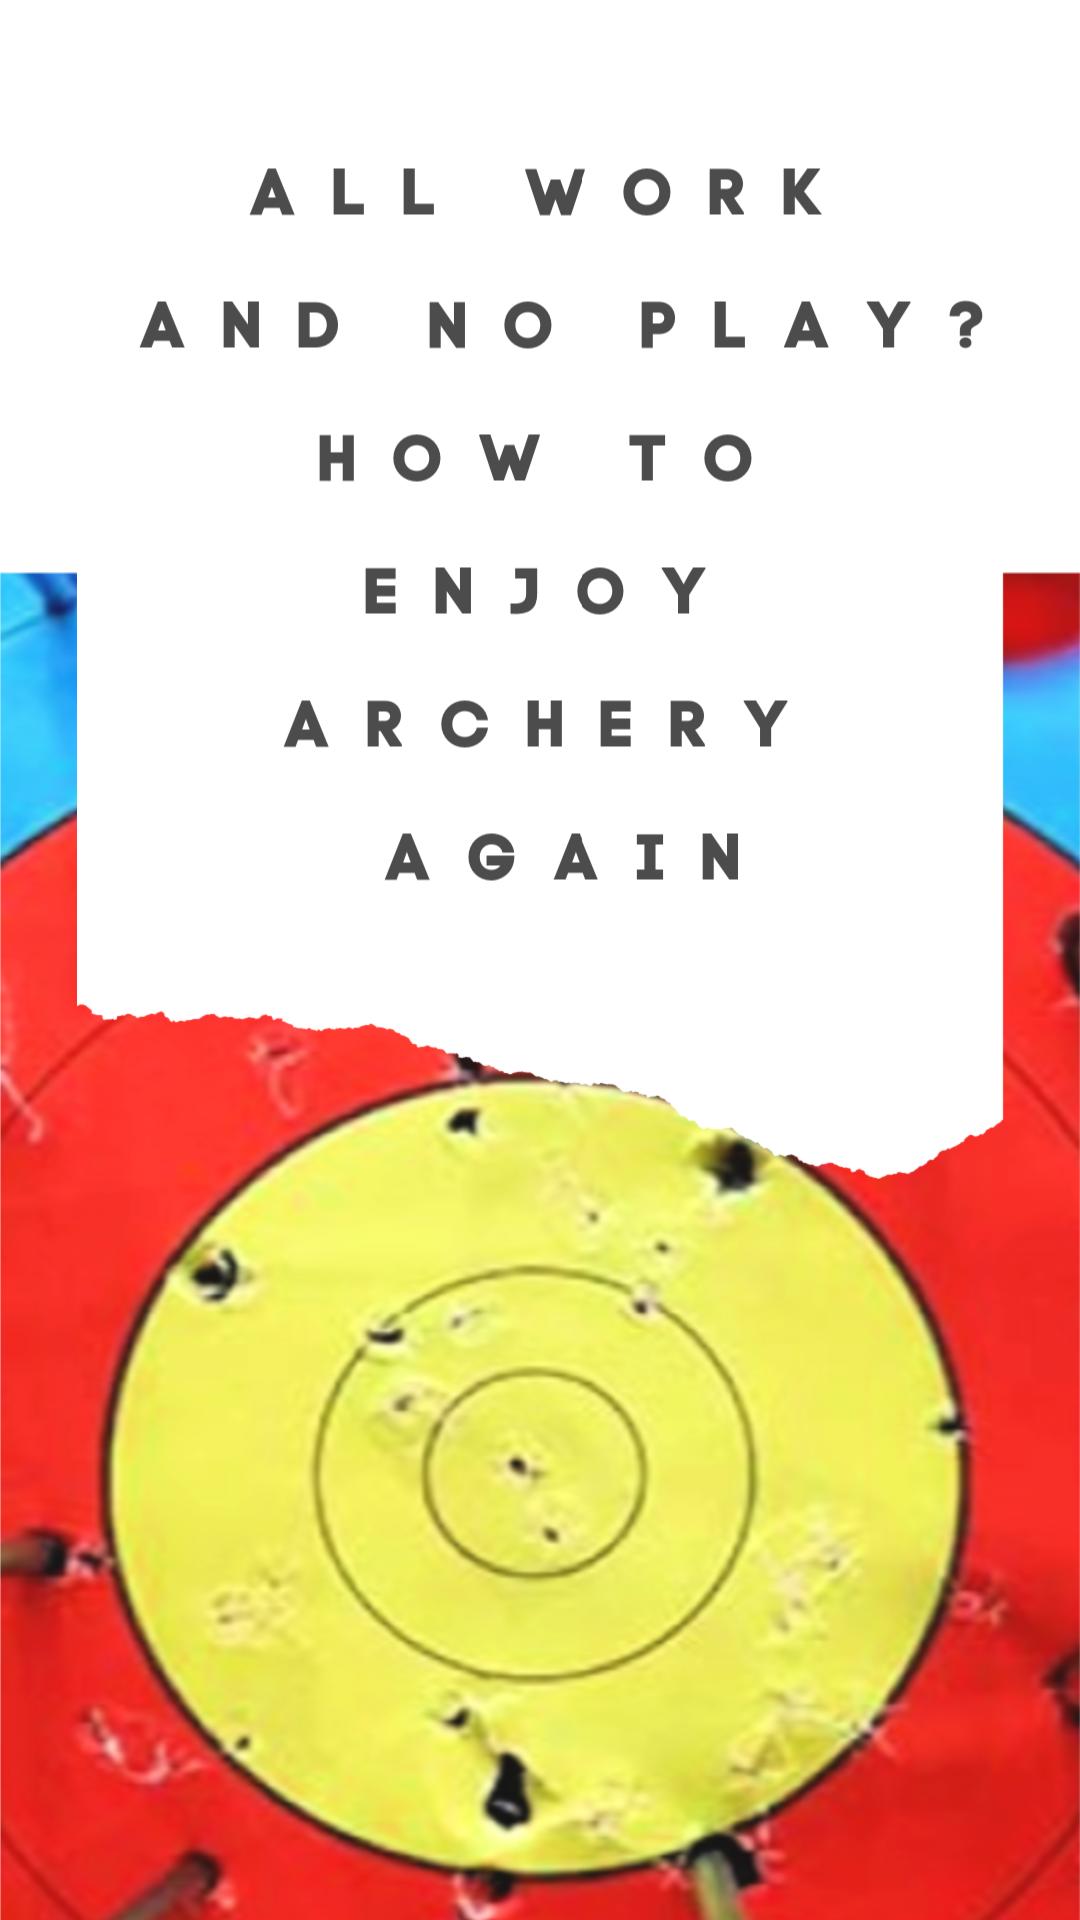 archery-hypnosis-archery-new-jersey-flemington-bethlehem-online.png